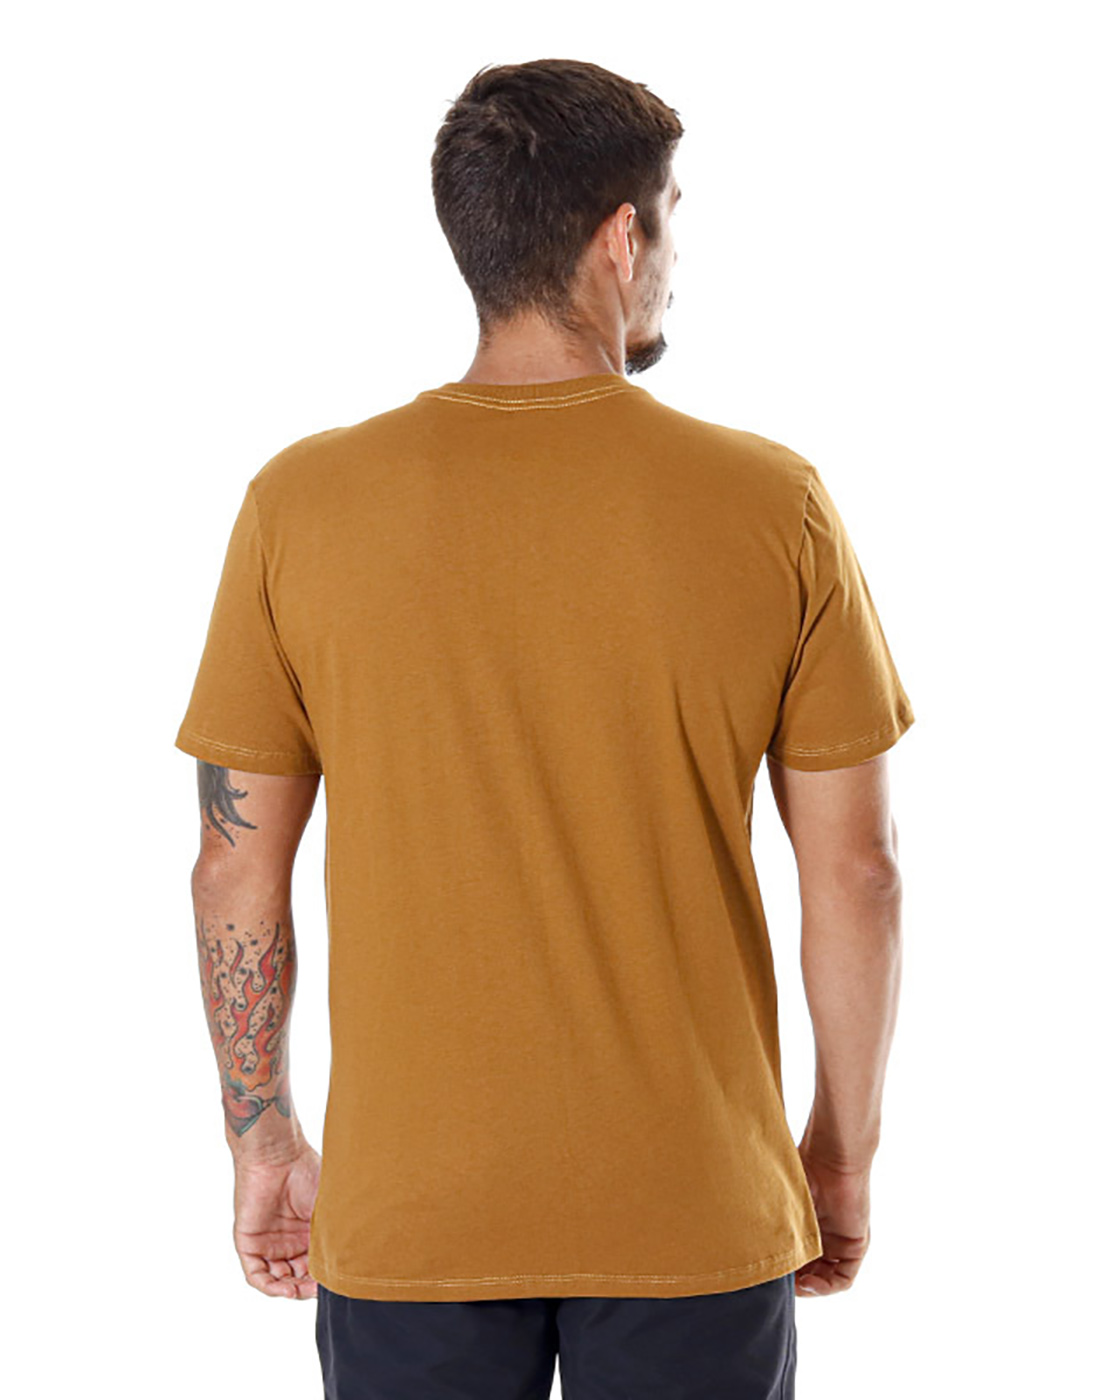 Camiseta Estampada Adrenalina Ocre Pena